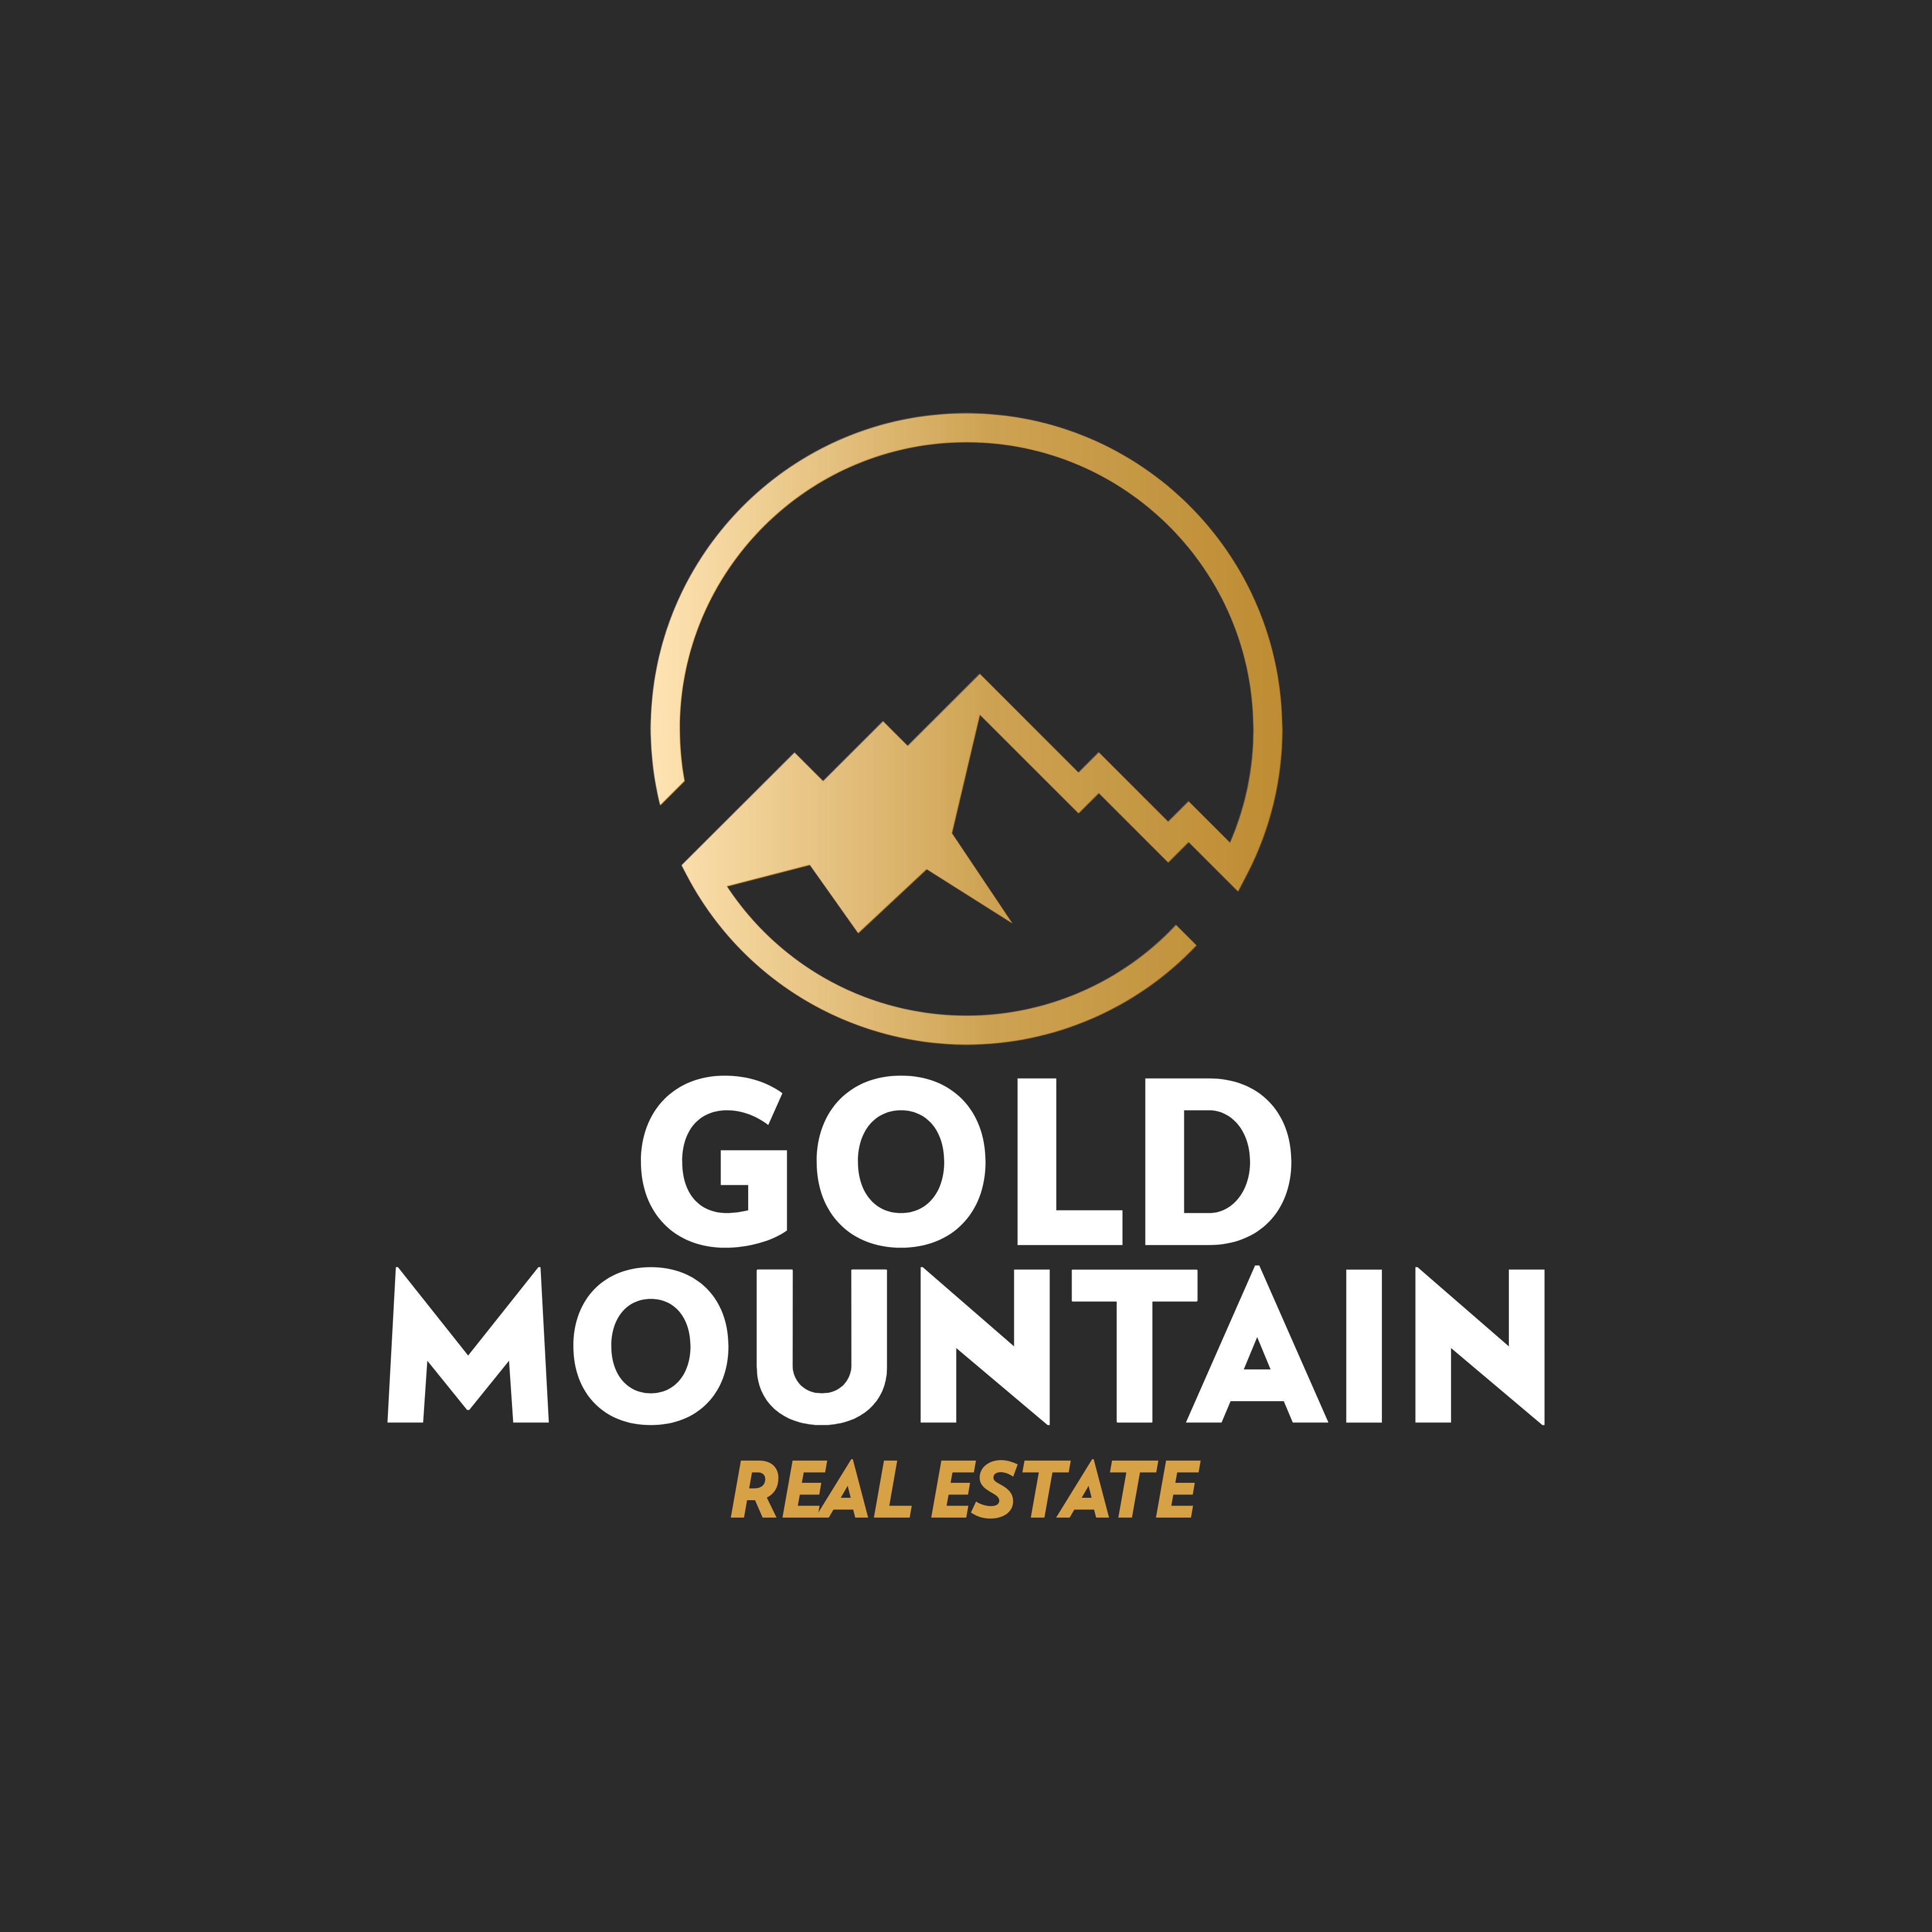 real estate logo maker with minimalistic illustrations of scenarios 561 el1